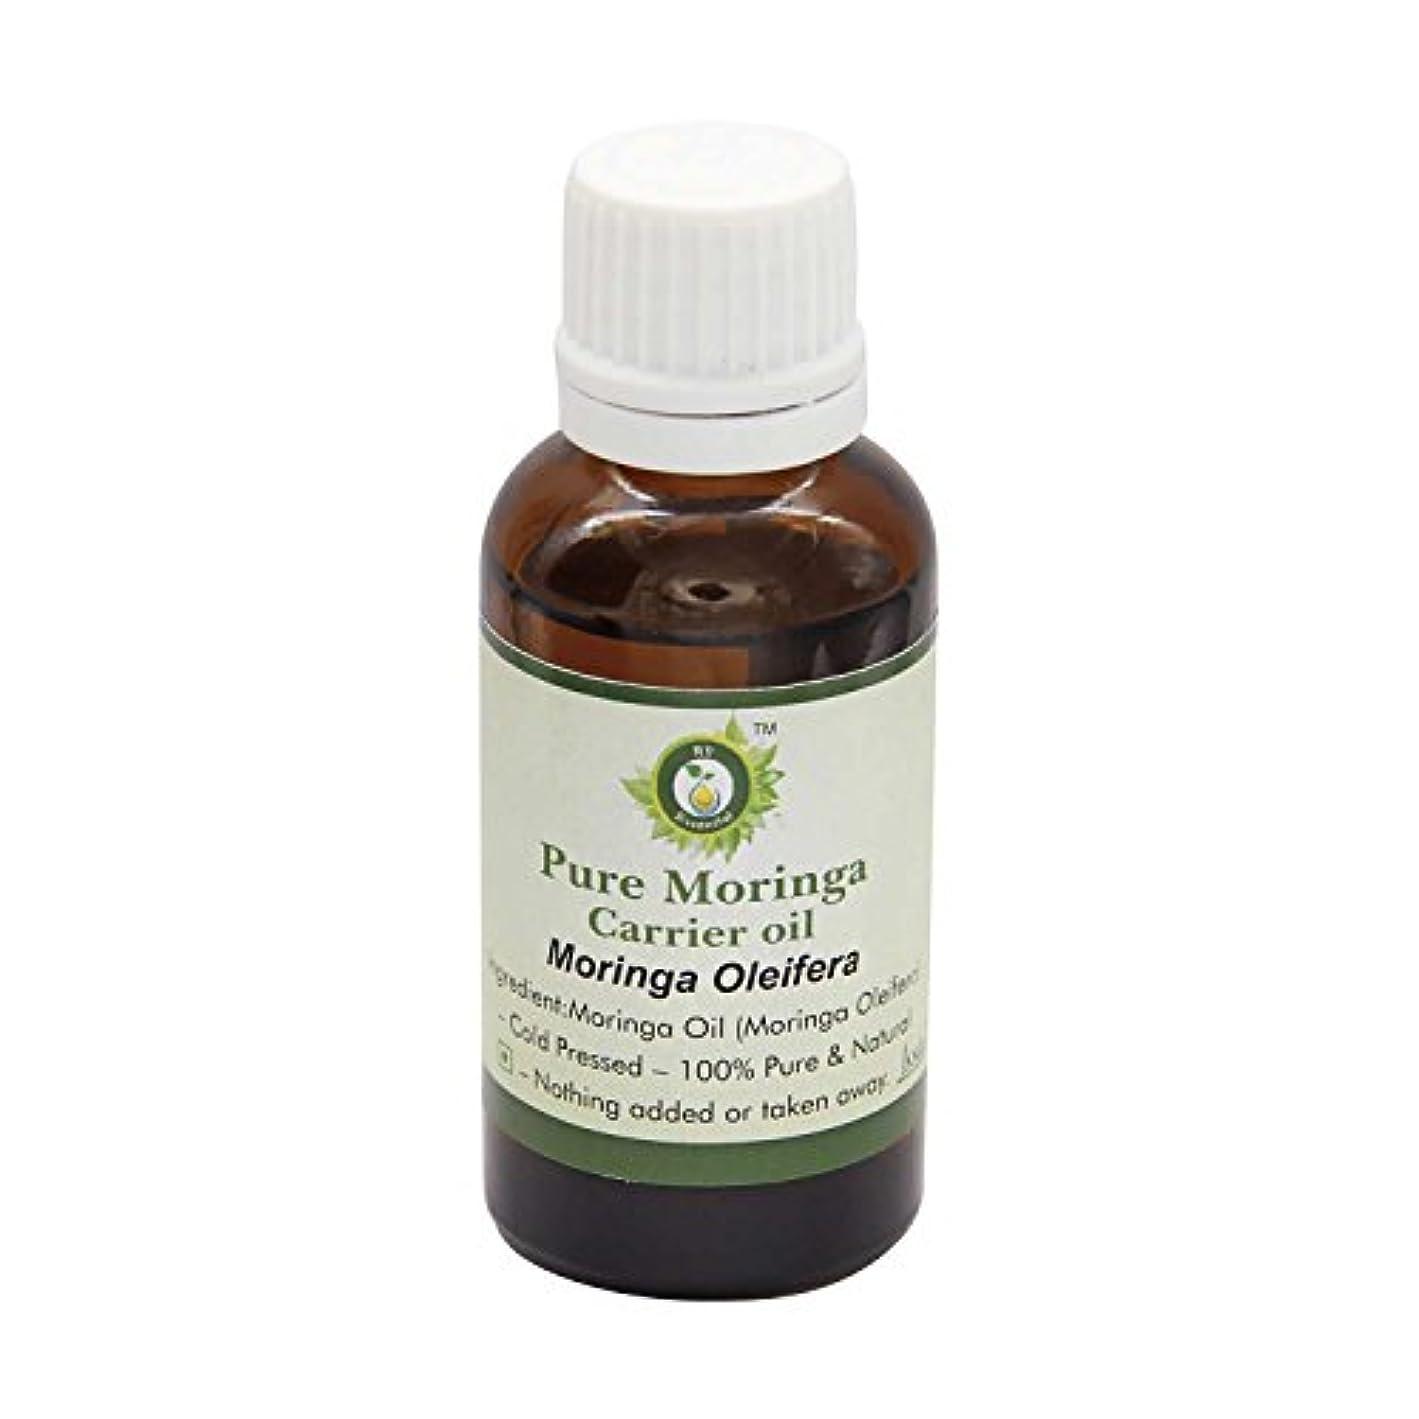 R V Essential 純粋なモリンガキャリアオイル100ml (3.38oz)- Moringa Oleifera (100%ピュア&ナチュラルコールドPressed) Pure Moringa Carrier Oil